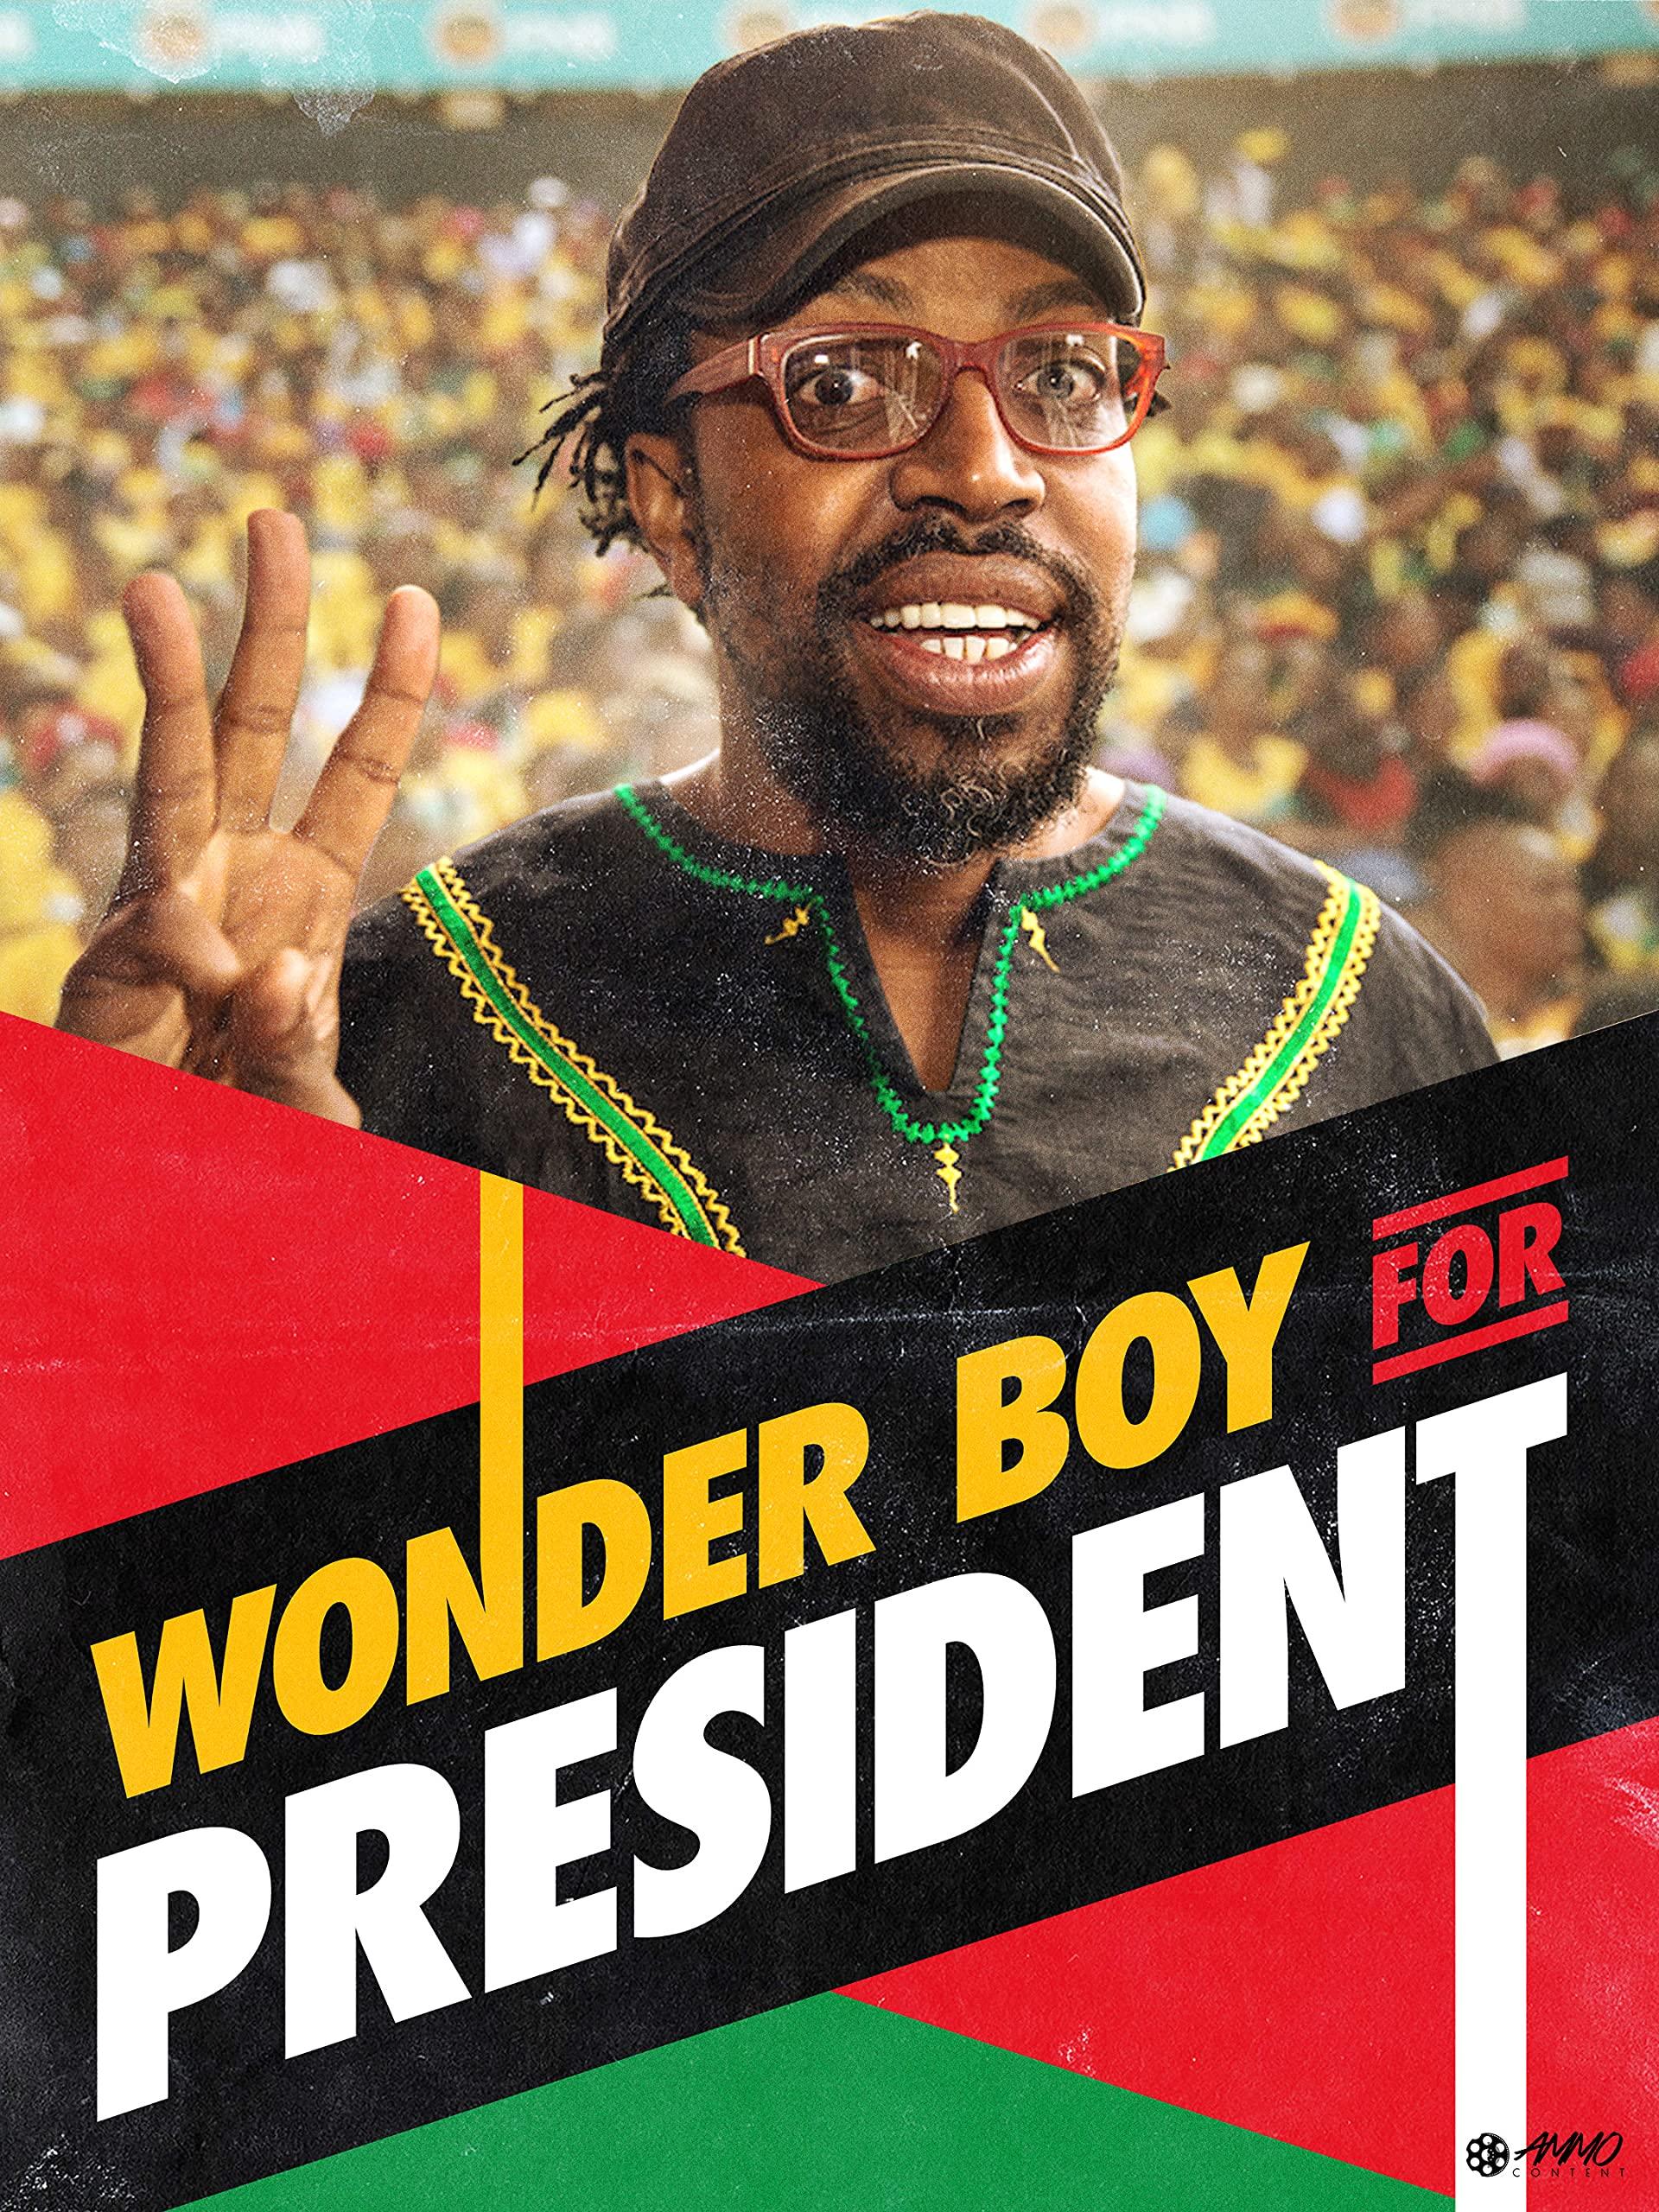 Wonder Boy for President on Amazon Prime Video UK